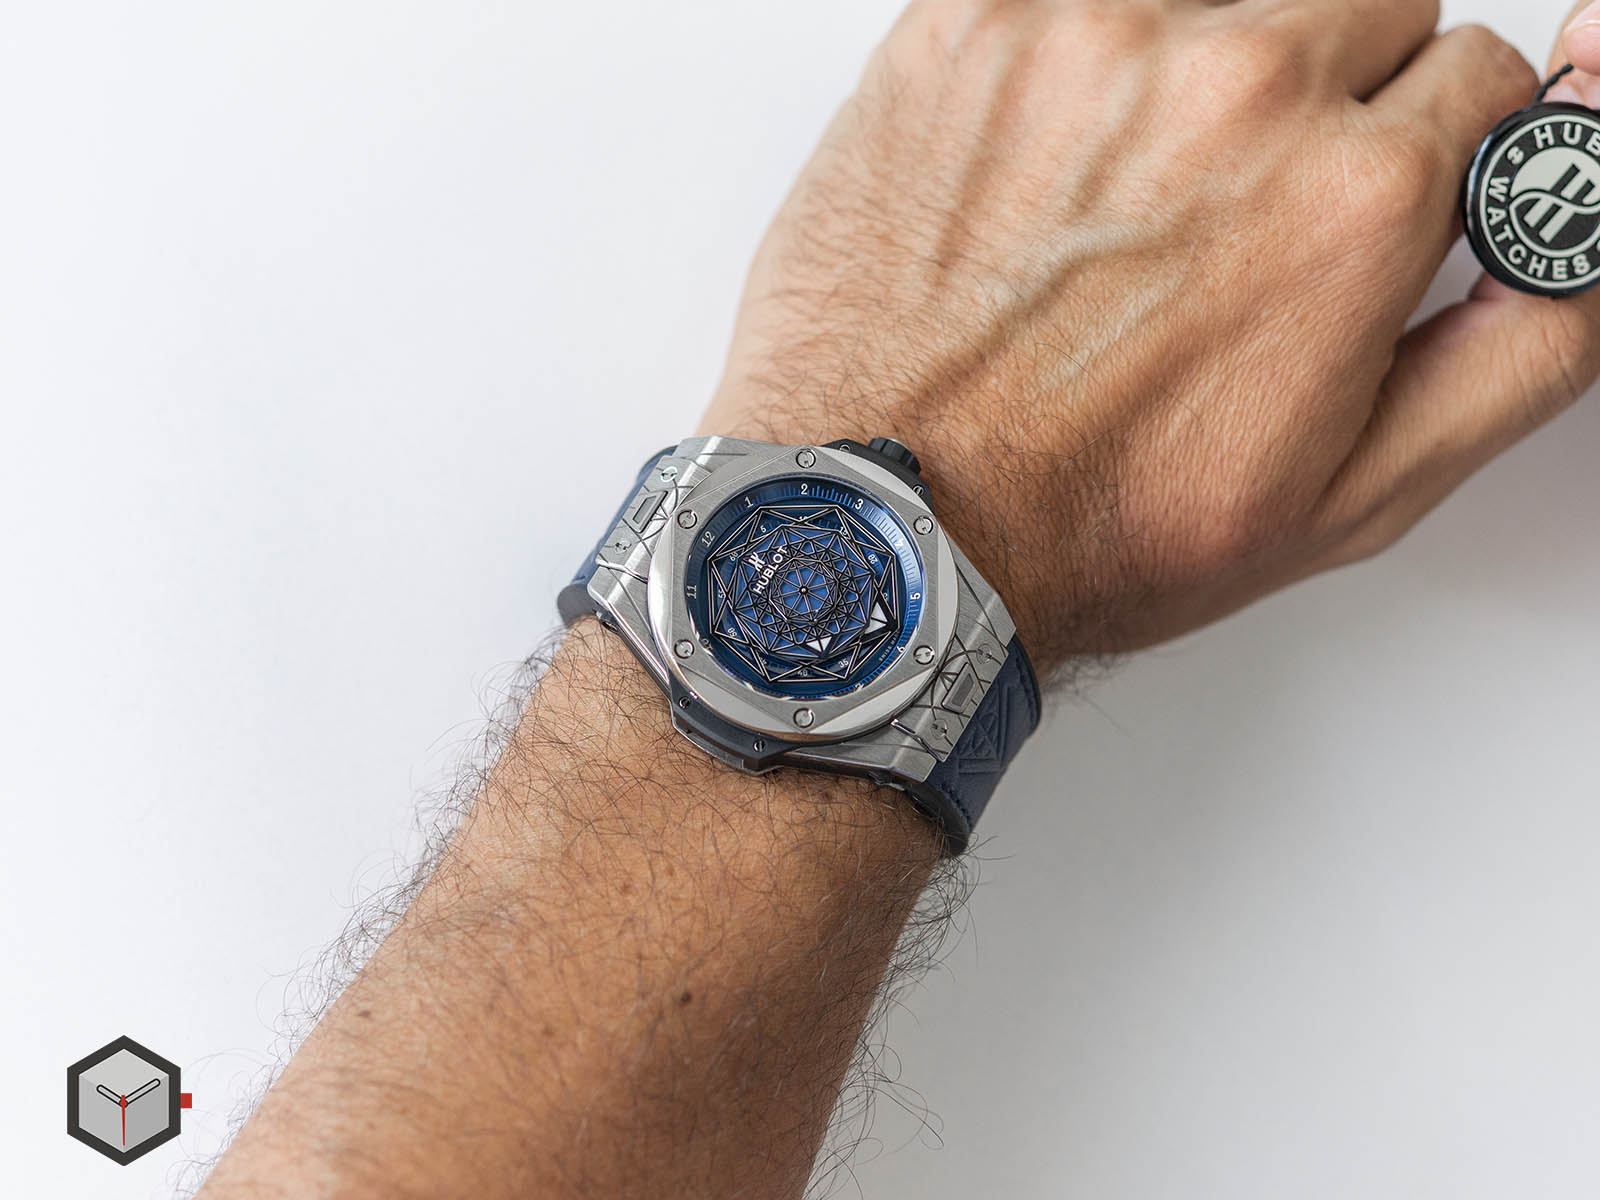 415-nx-7179-vr-mxm18-hublot-big-bang-sang-bleu-titanium-blue-10.jpg